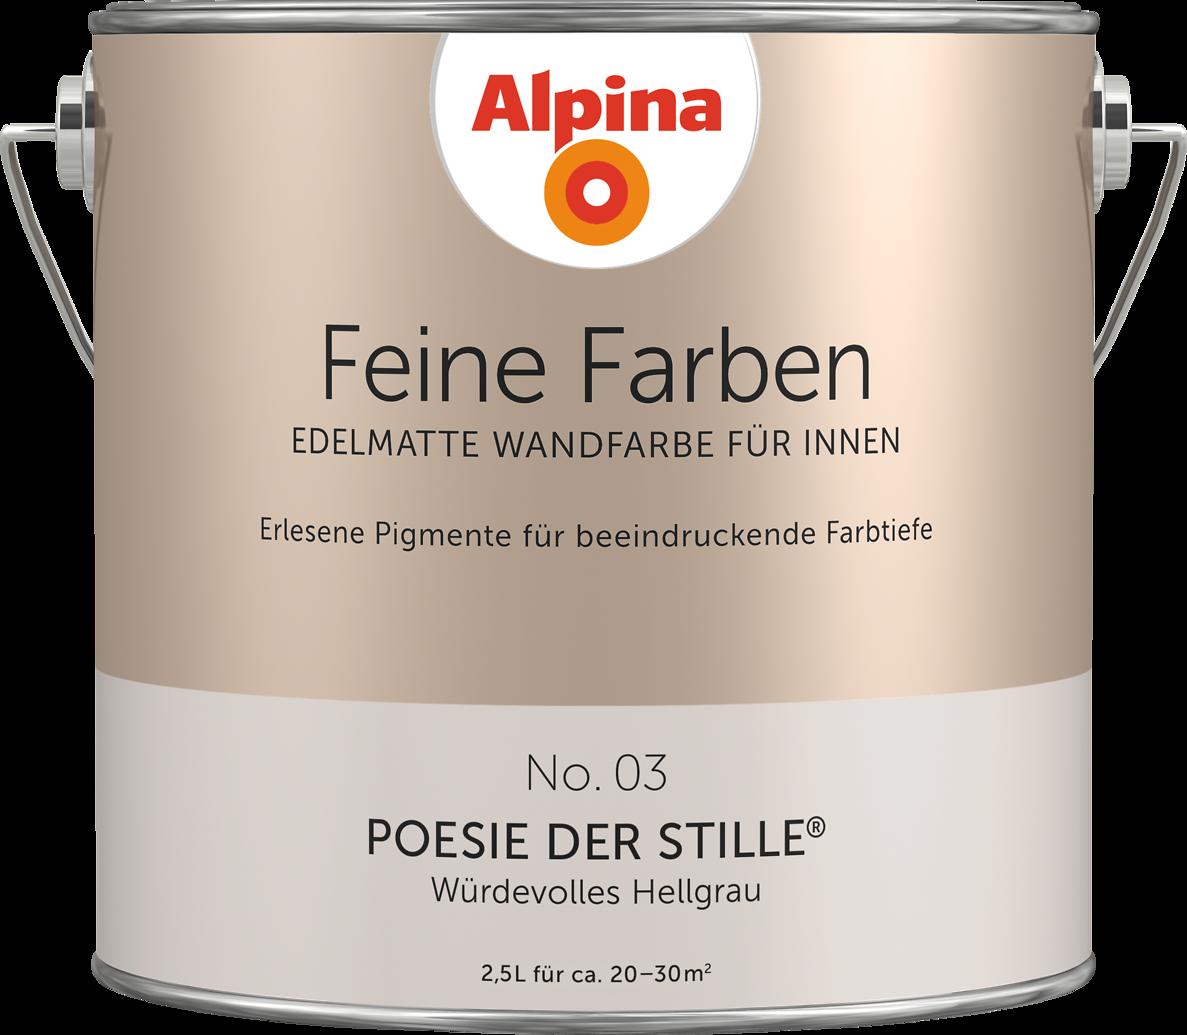 Alpina Feine Farben Edelmatte Wandfarben In Grau Alpina Farben